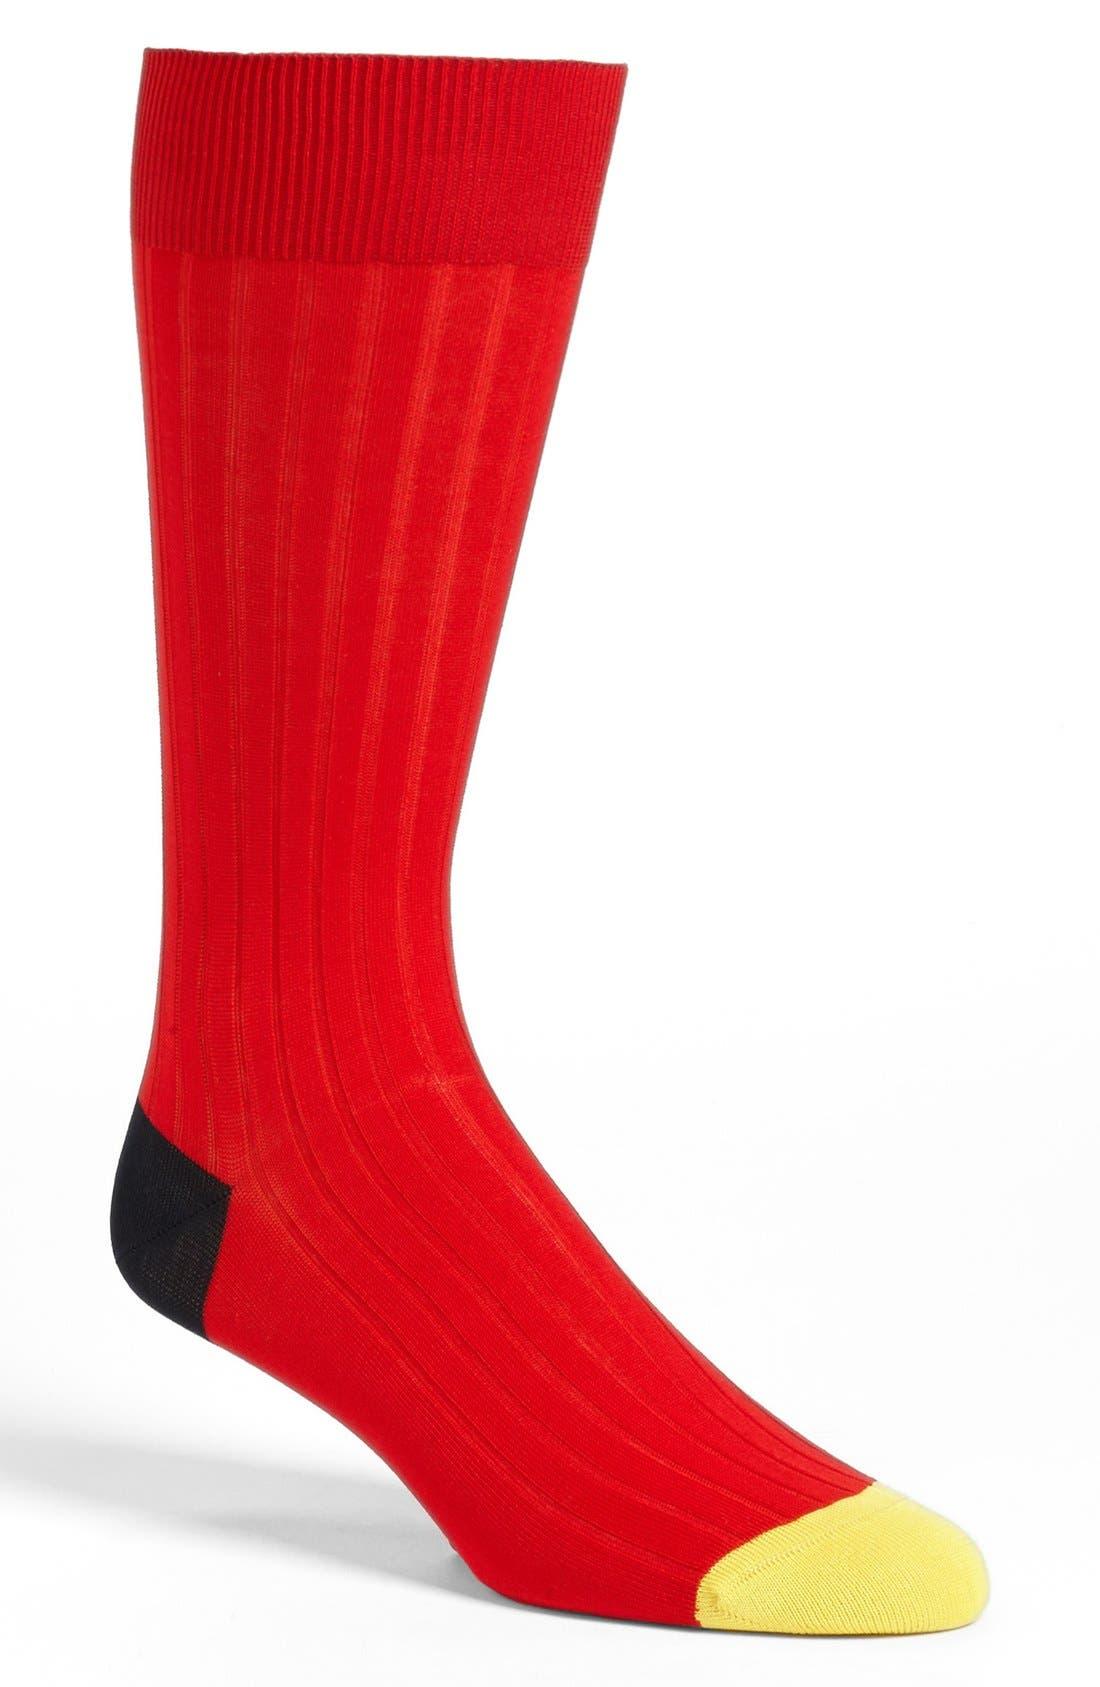 Main Image - Pantherella 'Portobello' Socks